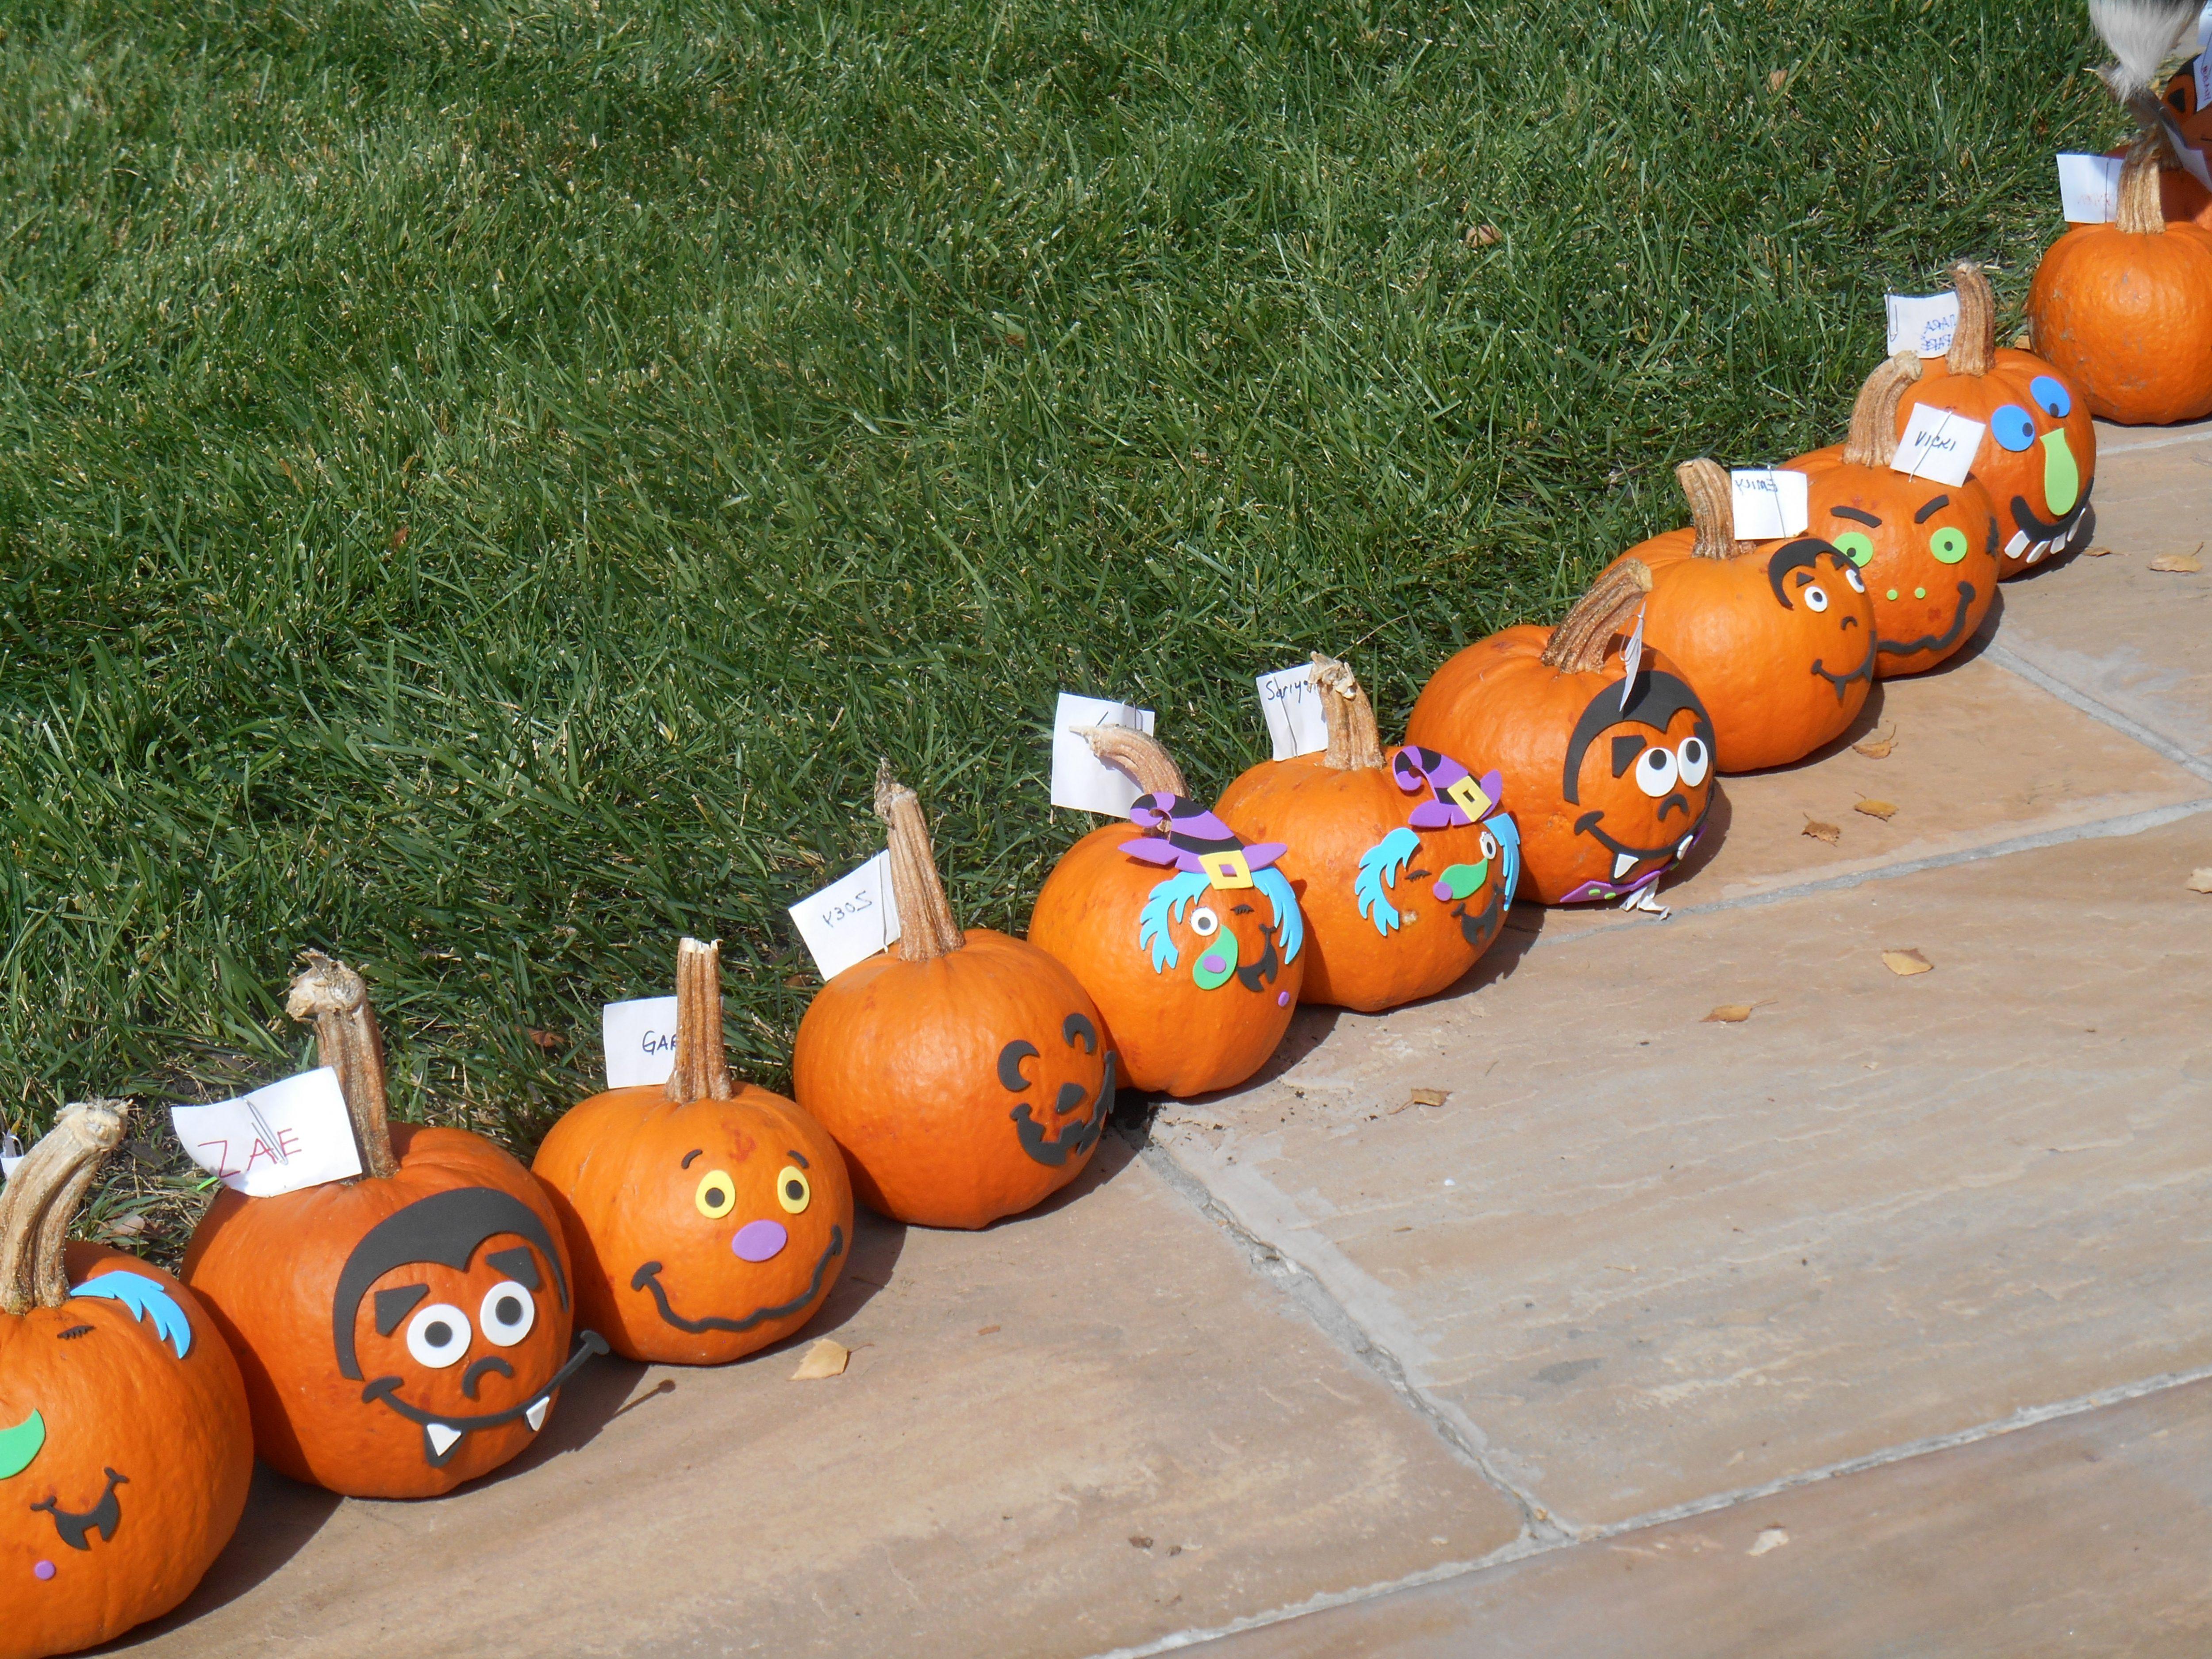 October 22, 2017 – Pumpkin Day